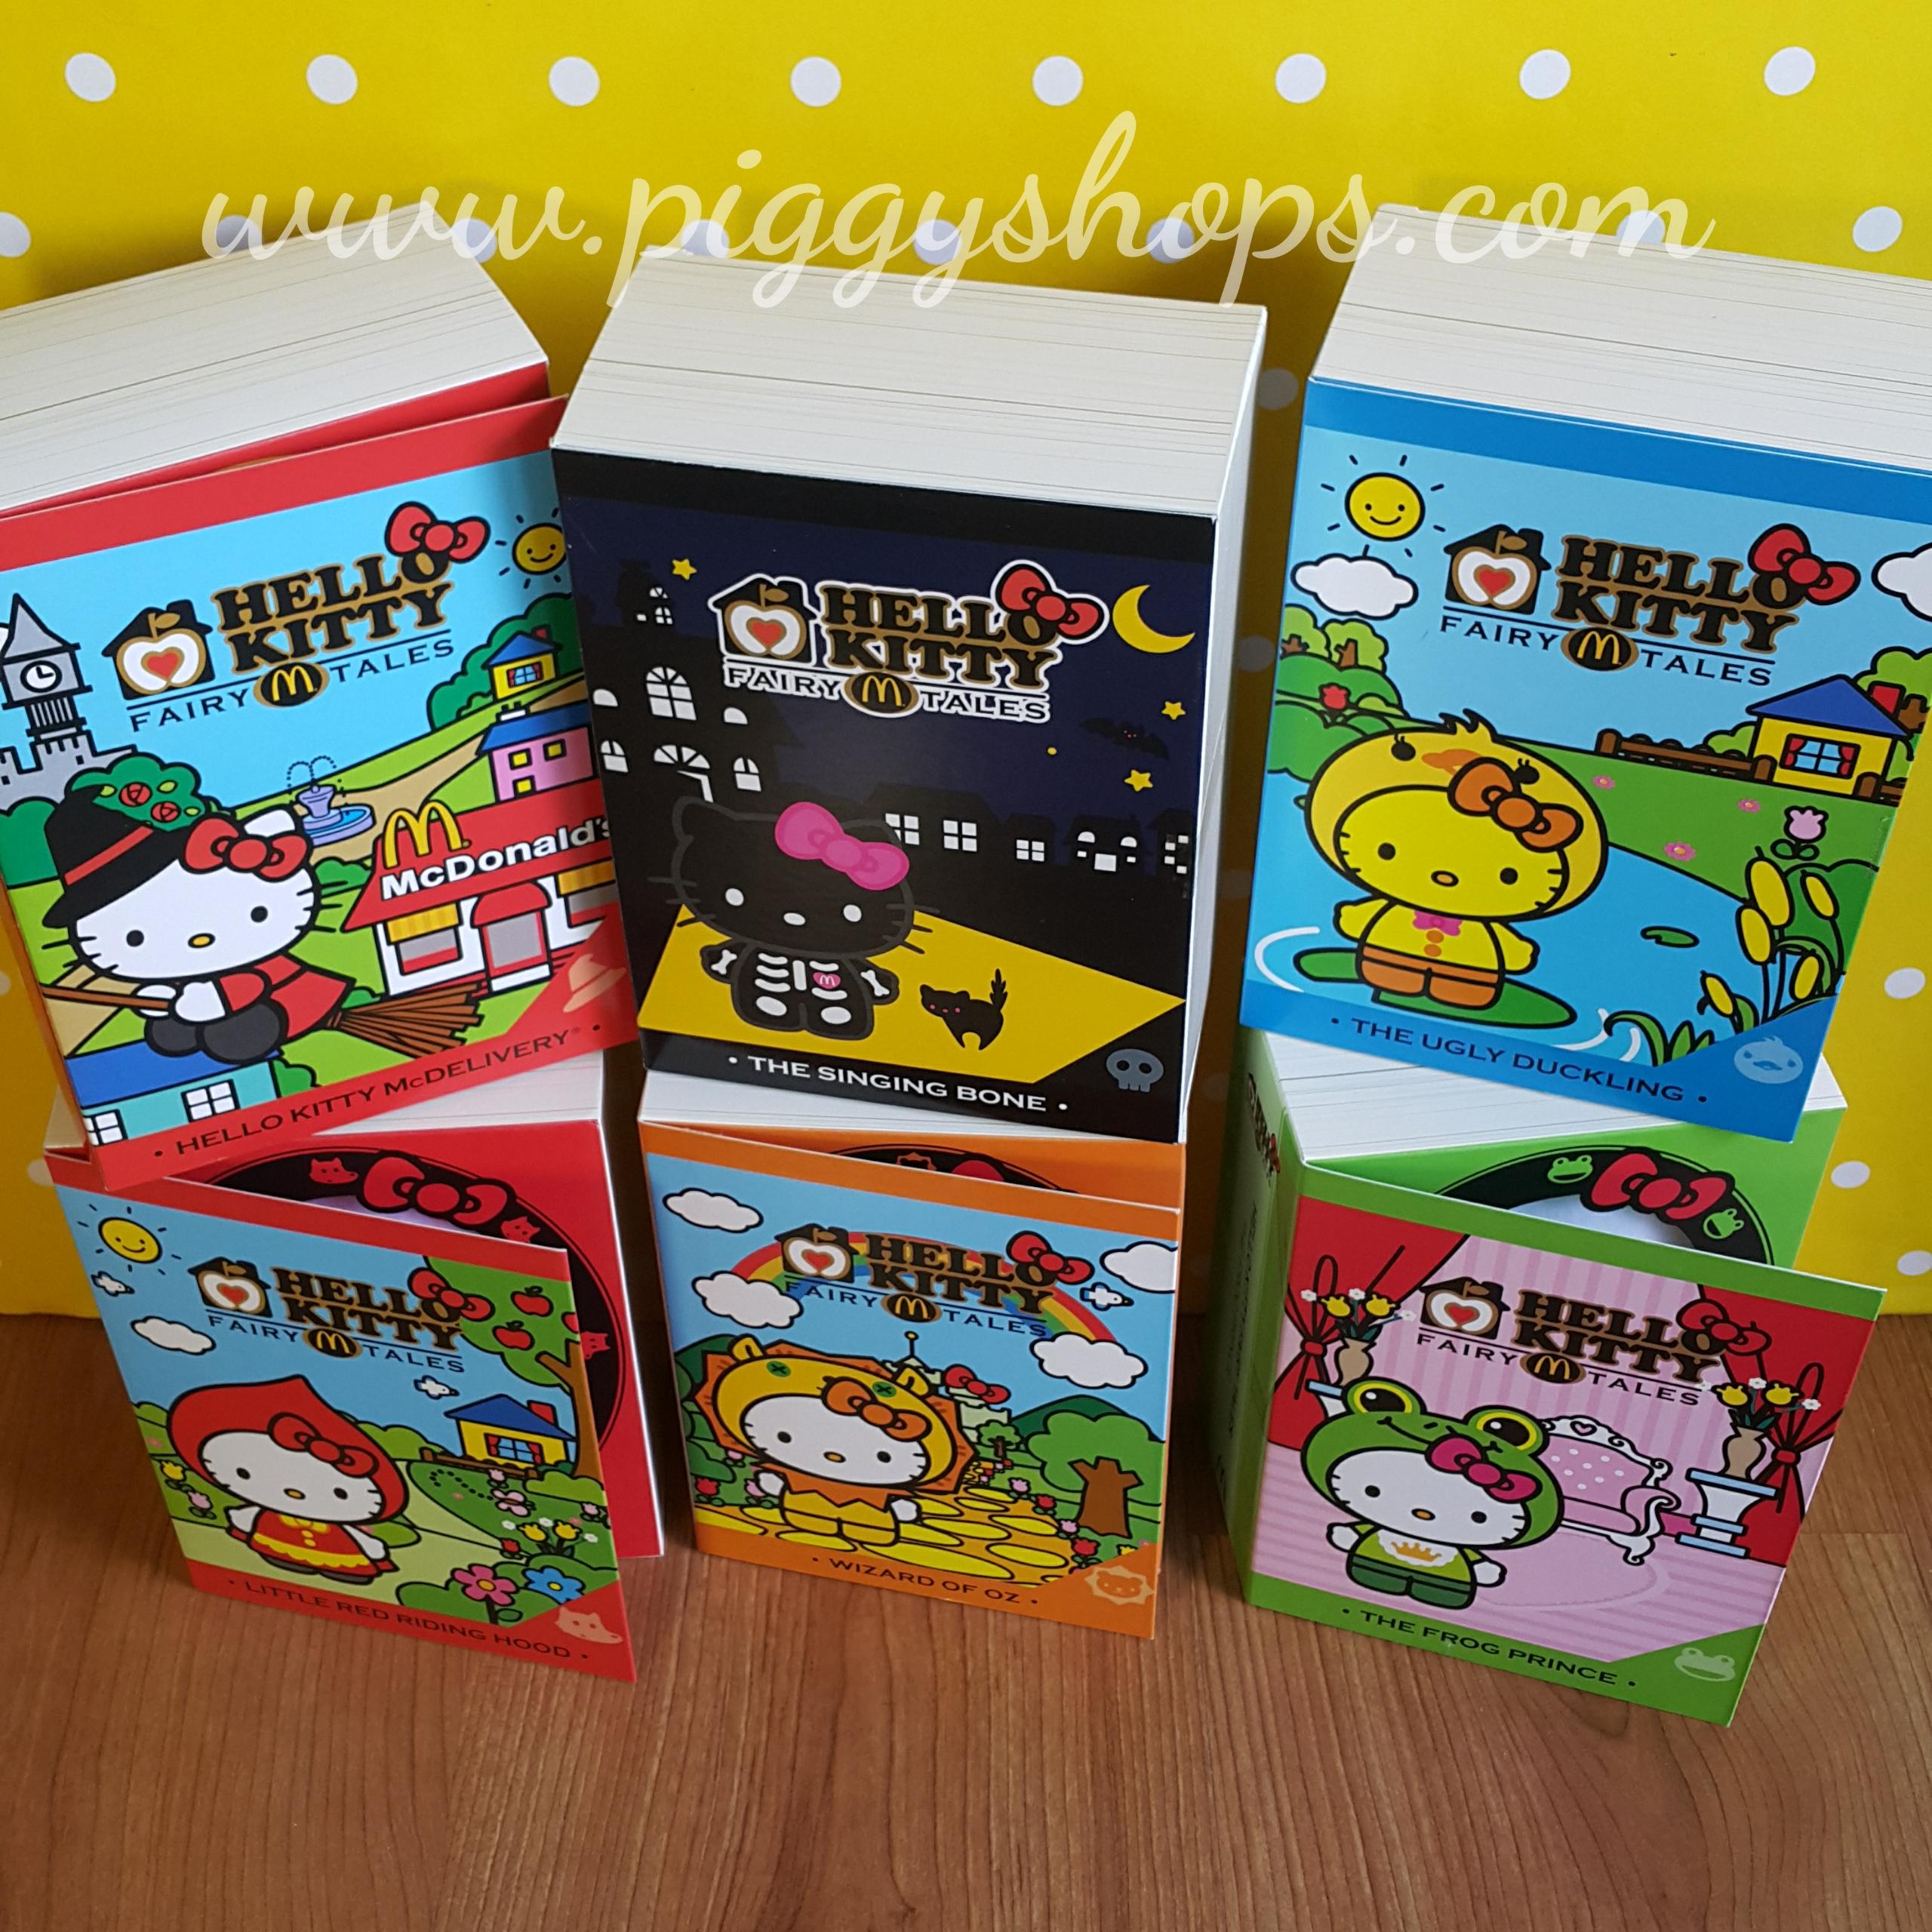 HELLO KITTY Fairy Tales full box set คอลเลกชั่นสะสมคิตตี้แฟร์รี่เทลล์เซ็ต 6 ชิ้น Ox , Red Riding Hood , Frog , Ugly Duckling , Mcdelivery , Witch , Singing , Bone